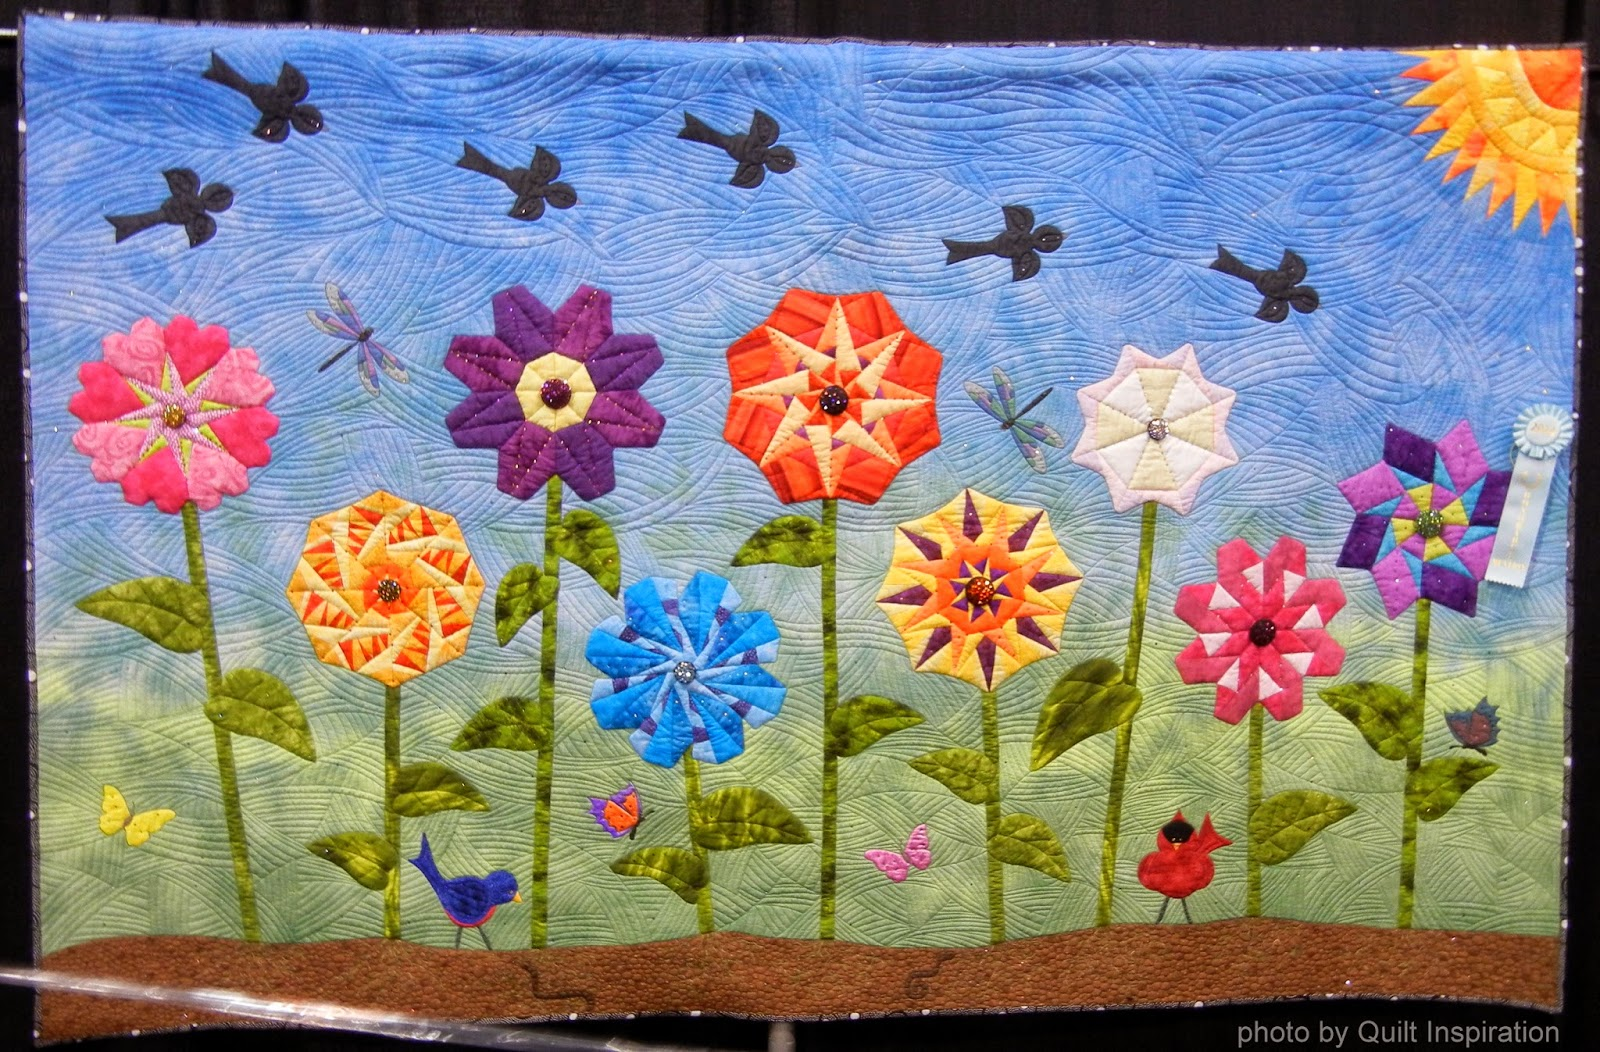 Quilt Inspiration: Bloooming beauties: Fun flower quilts